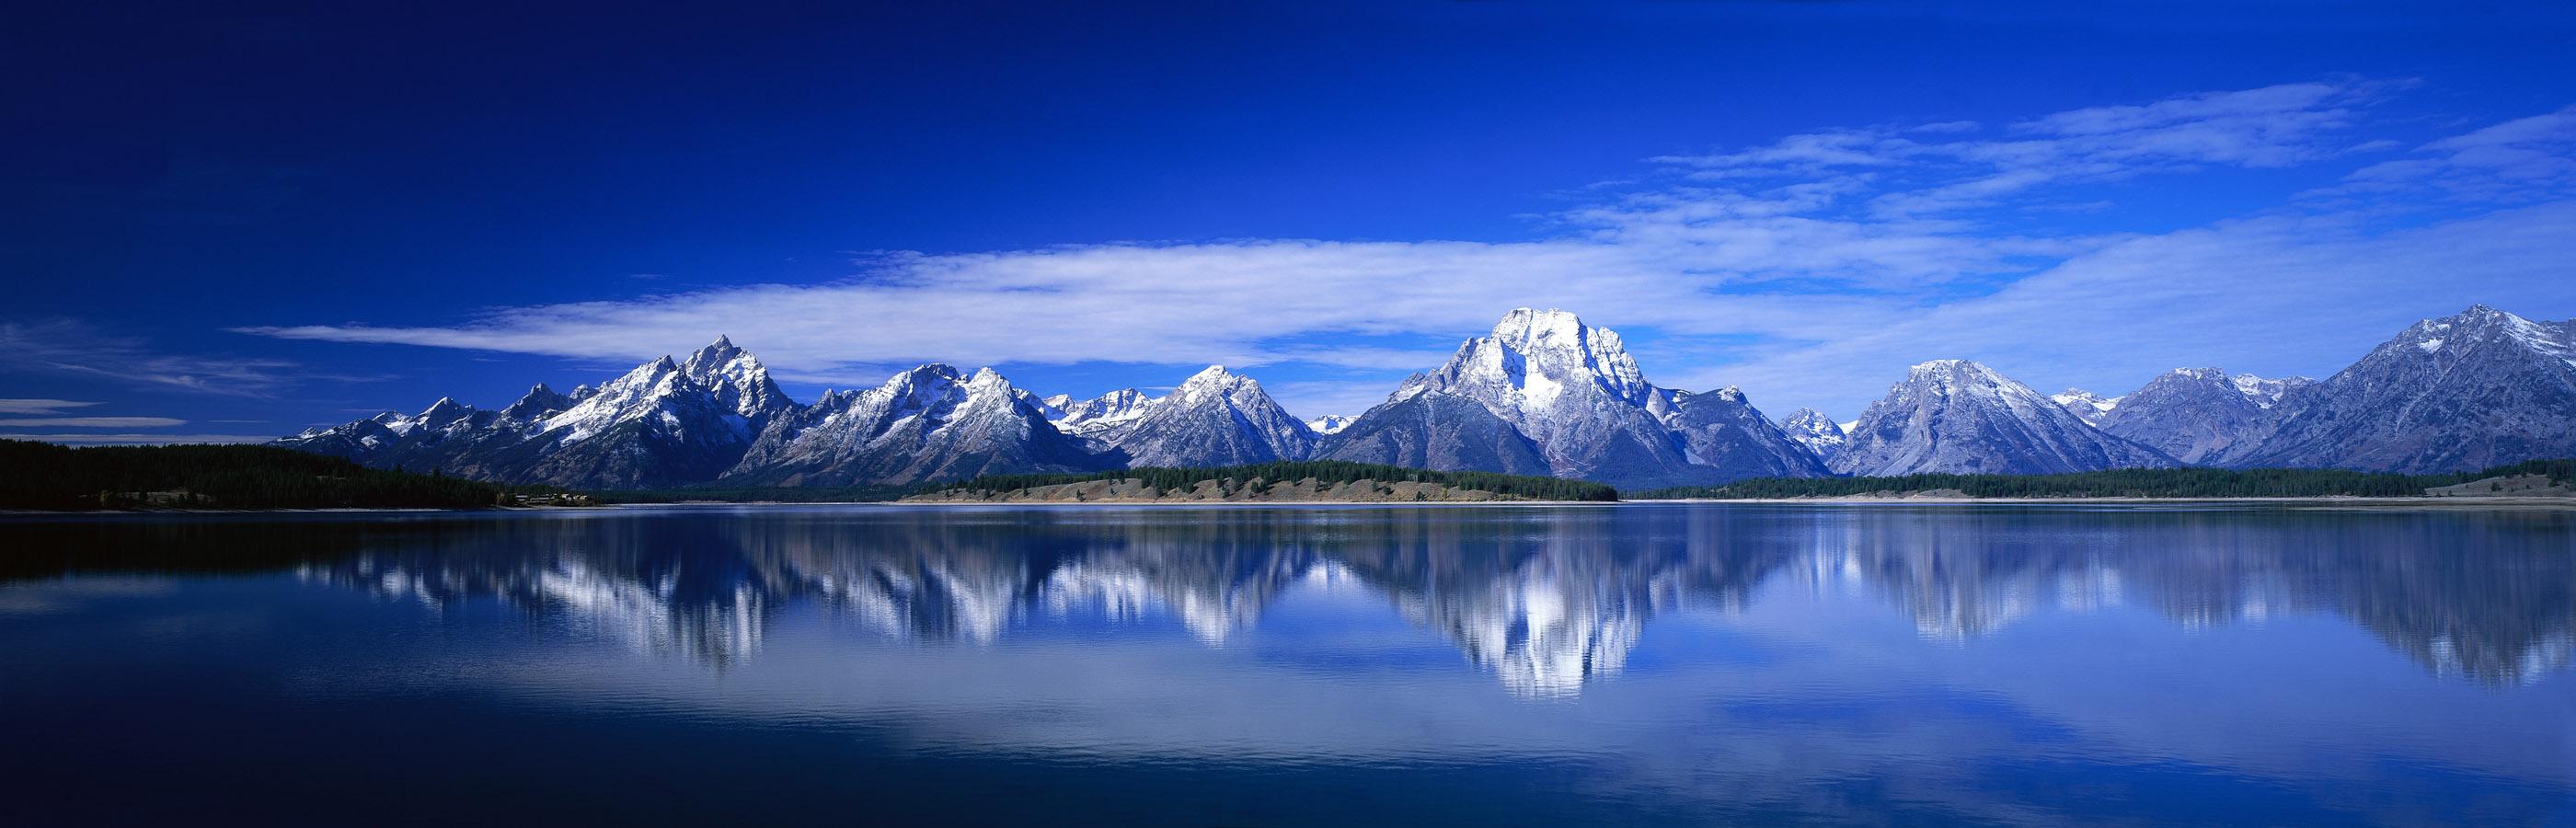 Mountain Lake Wallpapers Panorama Mountain Lake Myspace Backgrounds 2800x900